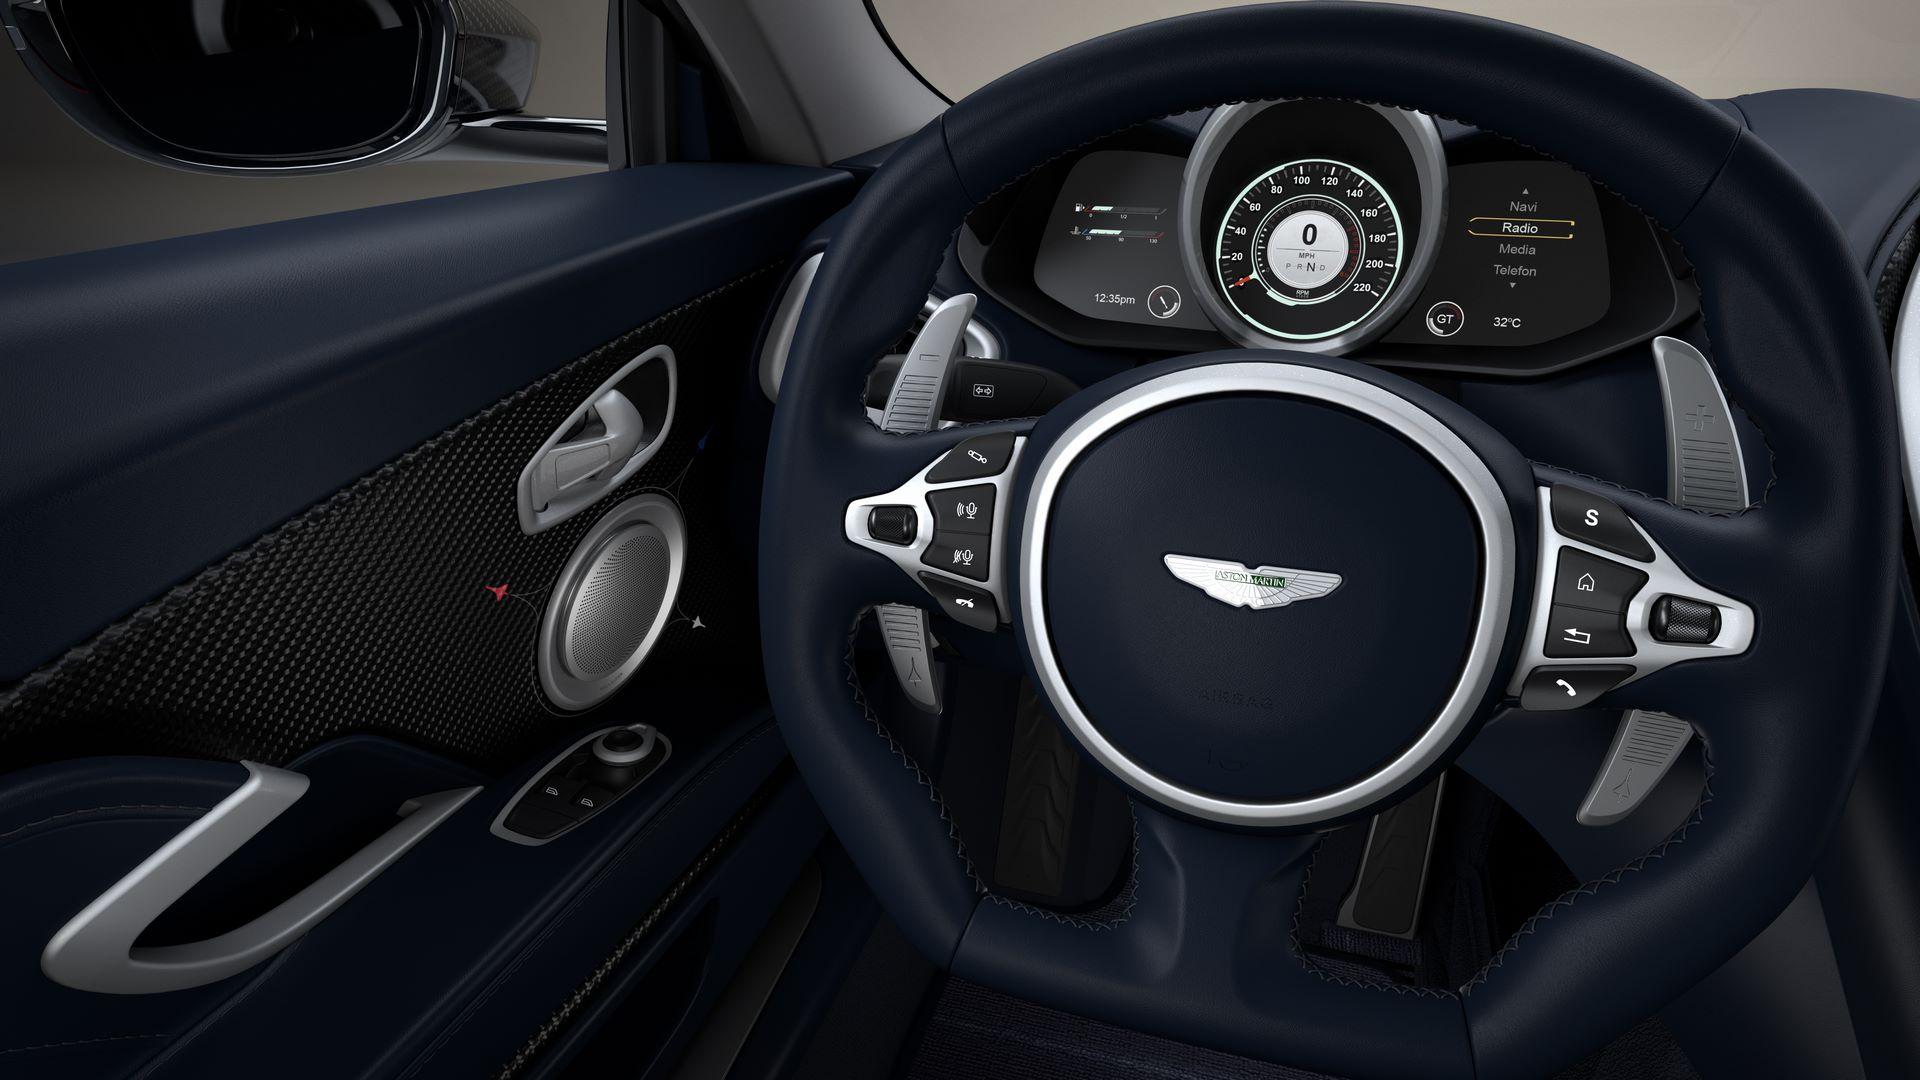 Aston-Martin-DBS-Superleggera-Concorde-Edition_14